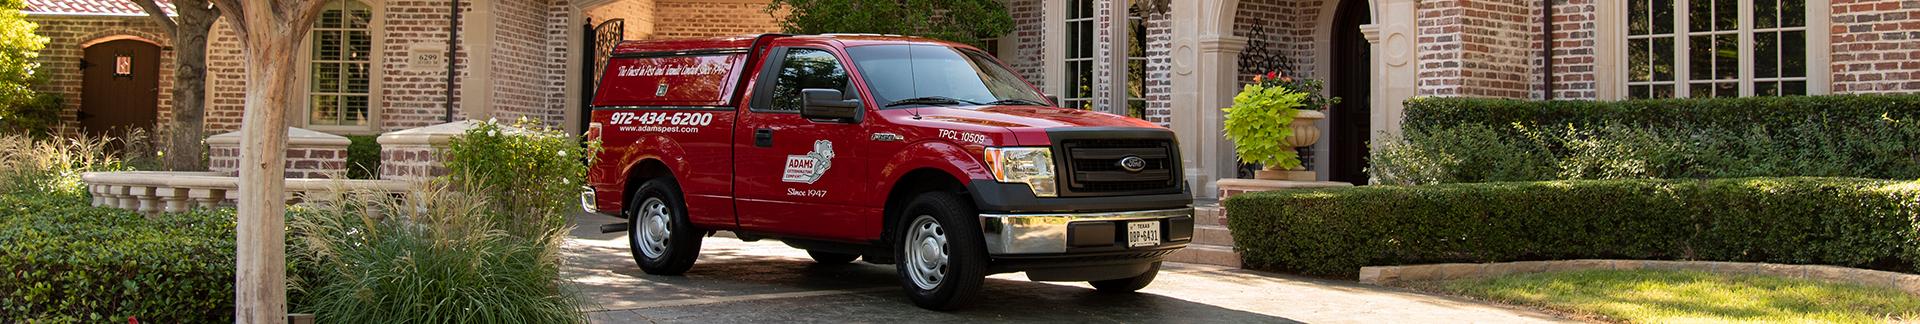 adams pest control's truck in lewisville tx